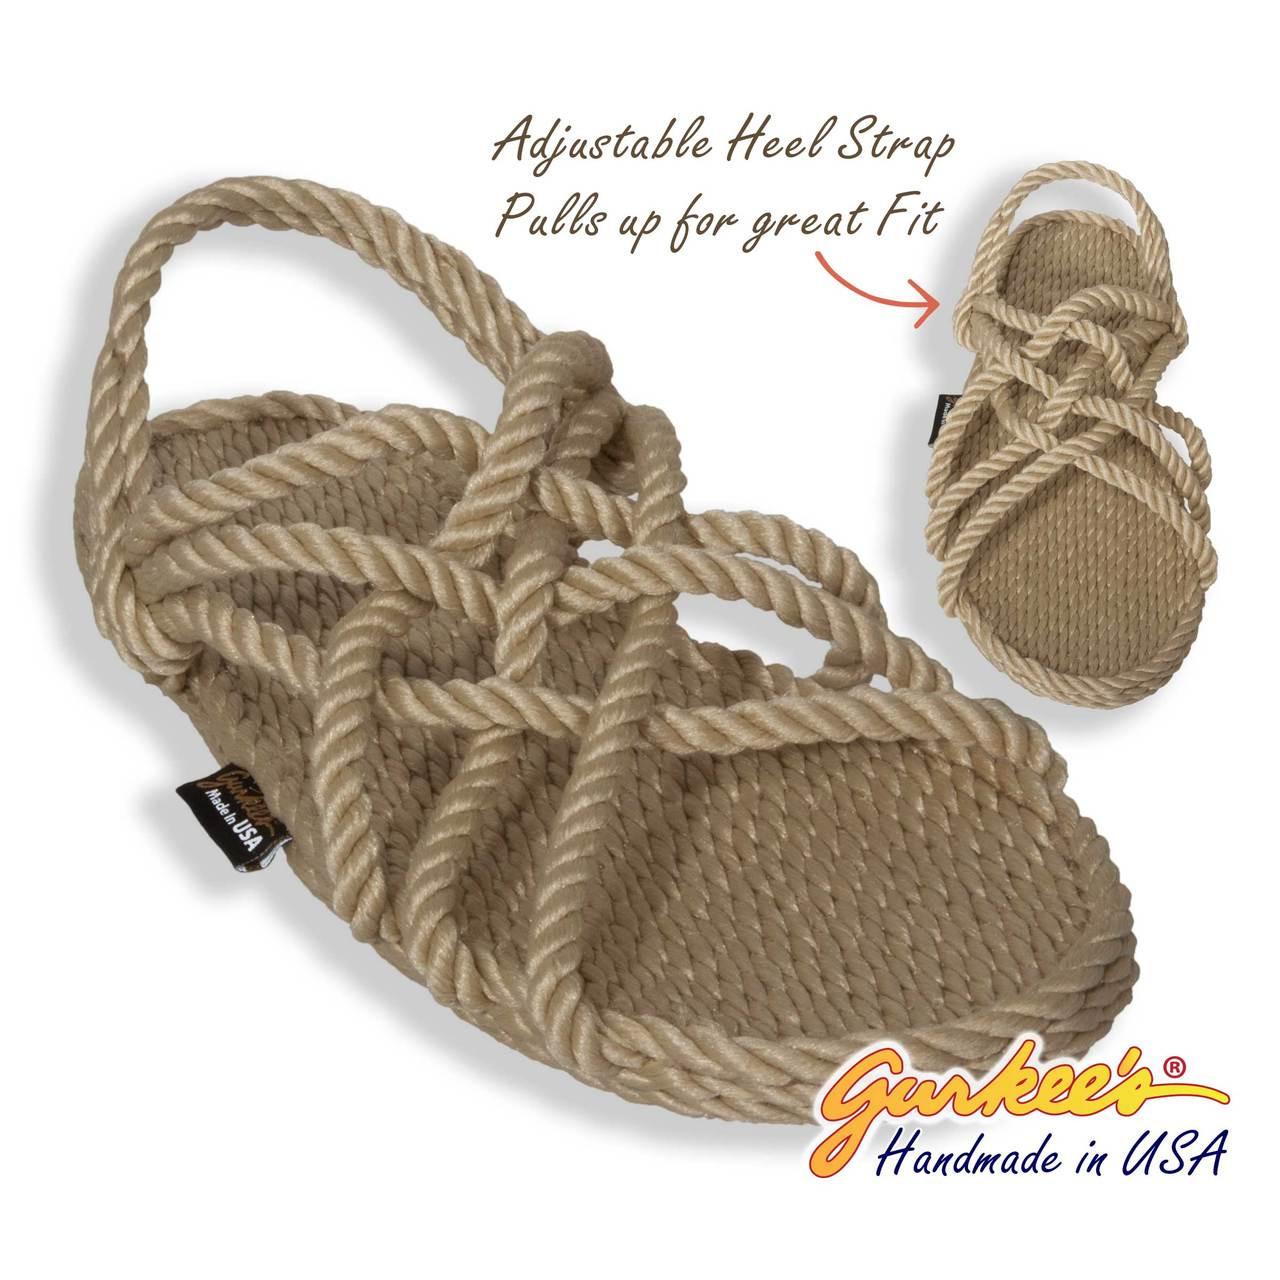 Classic Neptune Tan Rope Sandals - Gurkee's